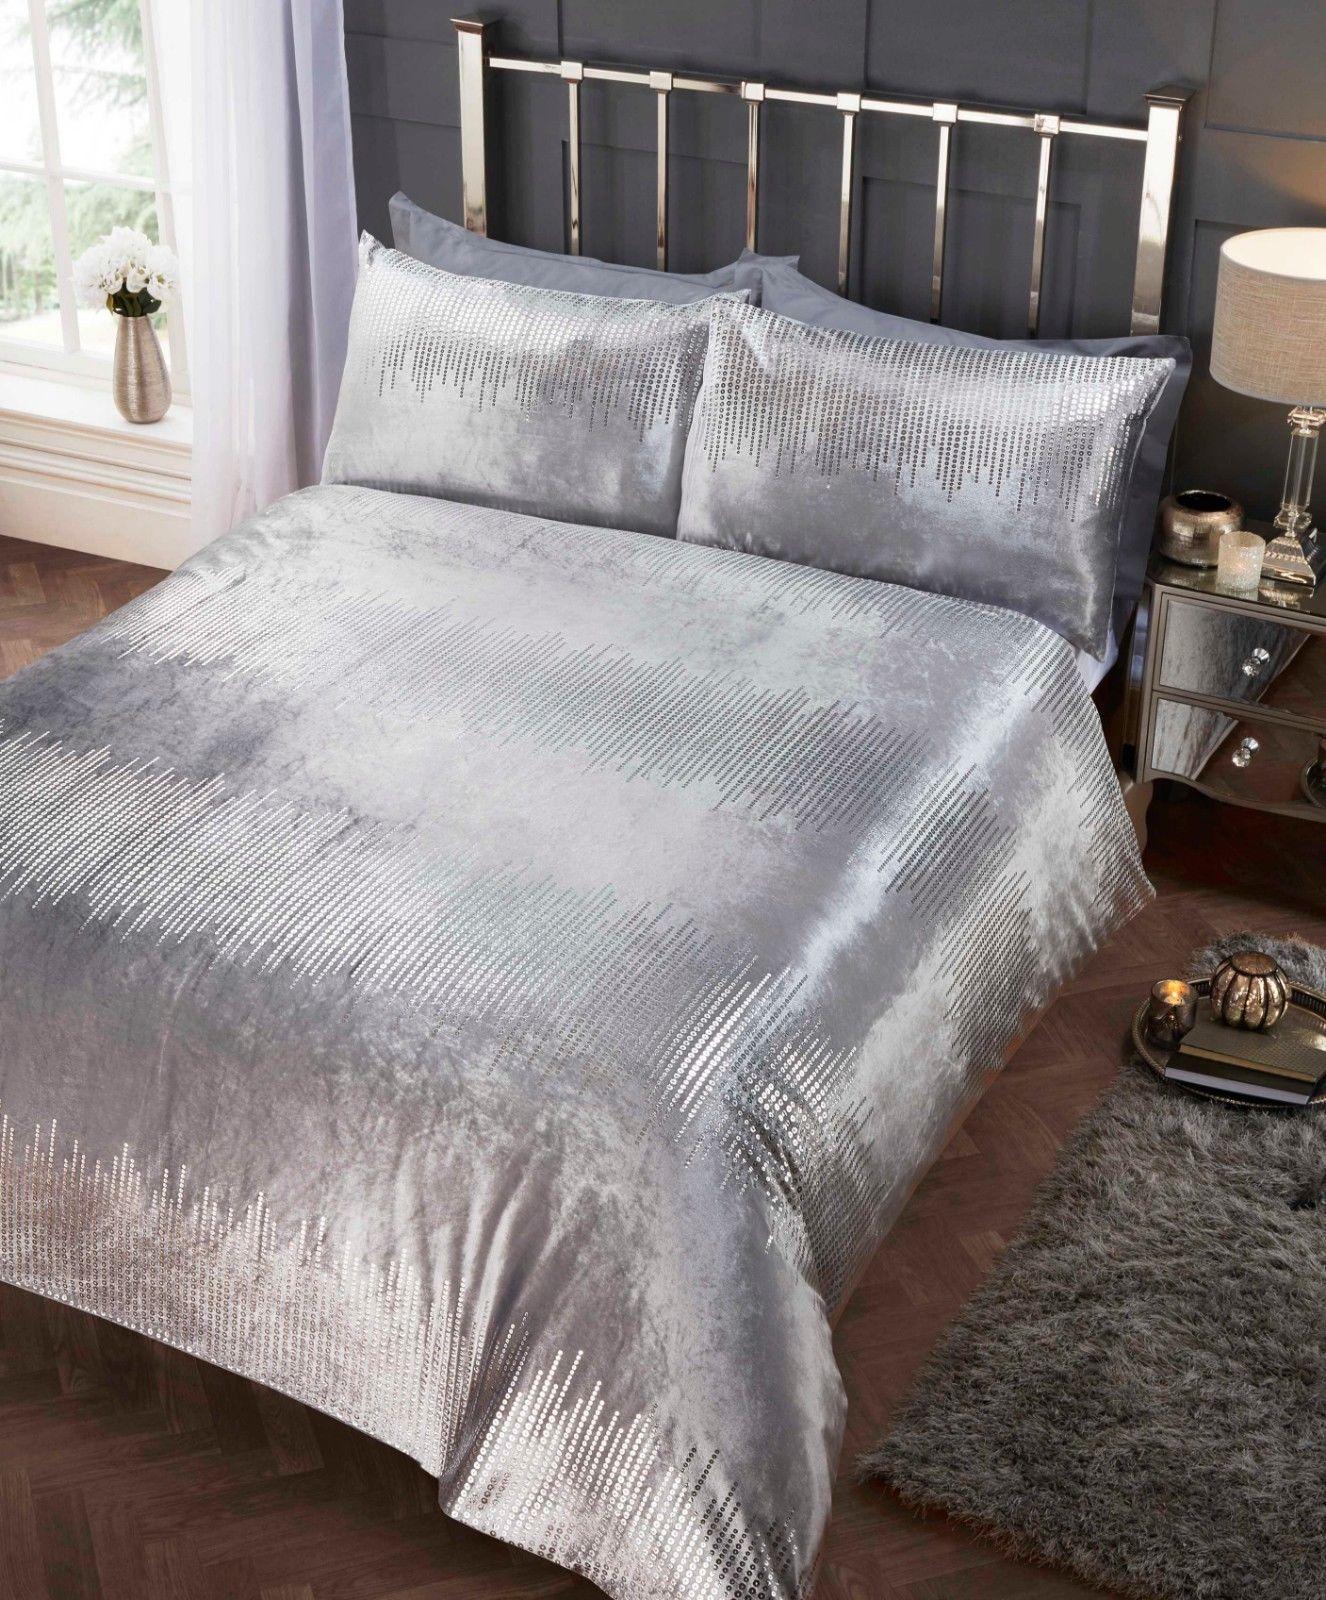 357c73da17a75 Rapport Crushed Velvet Tiffany Sequin Effect Duvet Cover Bedding Set  Silver. £24.99 ...